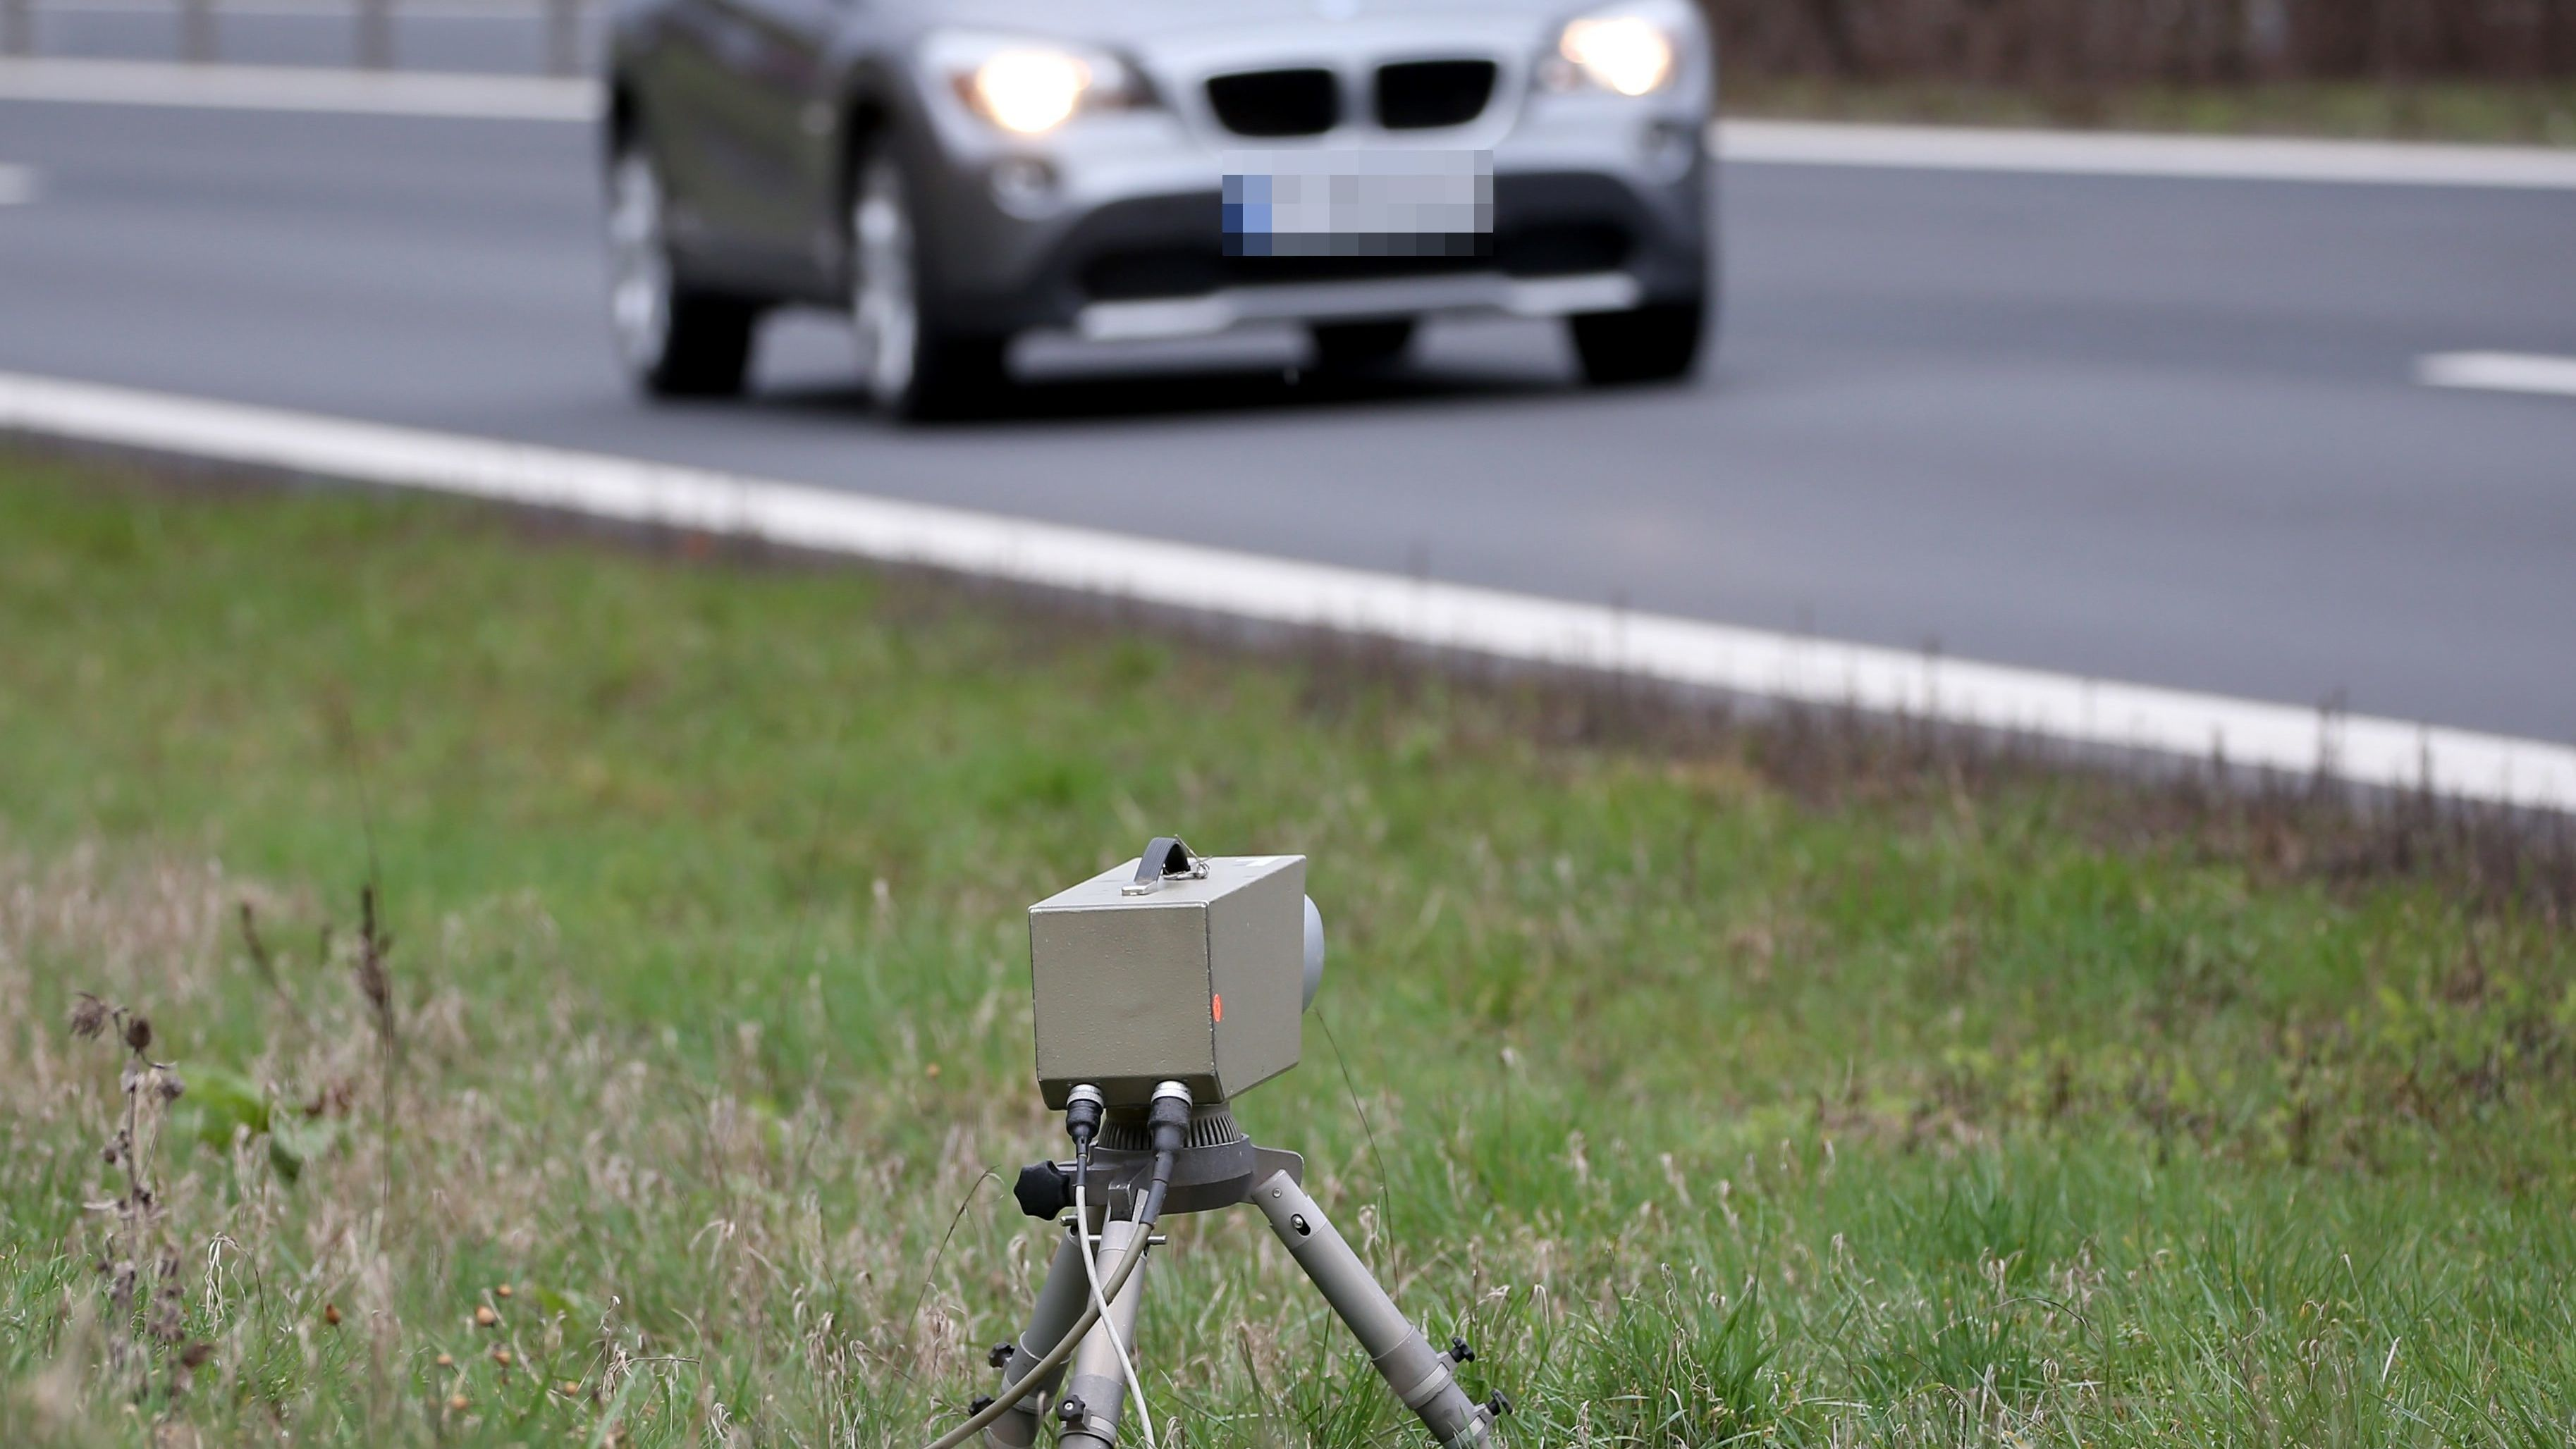 Radarfalle am Straßenrand (Symbolbild)